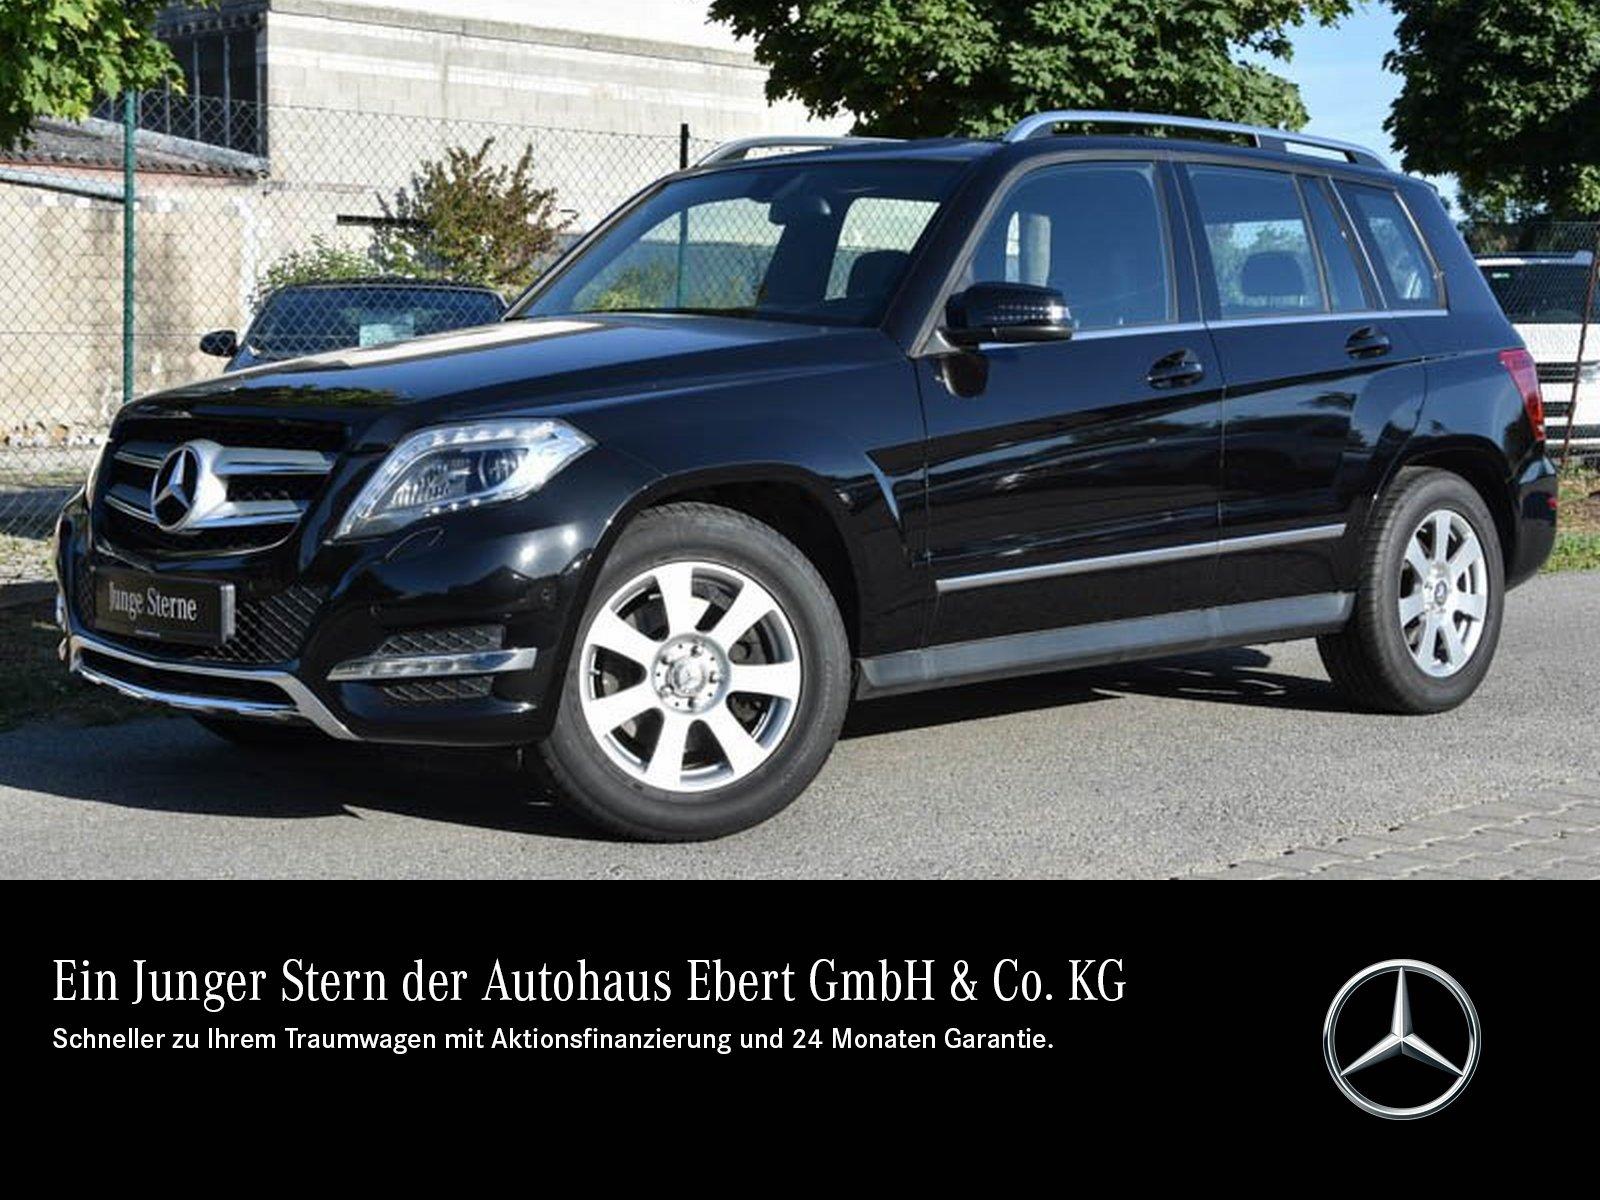 Mercedes-Benz GLK 220 CDI 7G+NAVI+PTS+AHK+EASY-PACK+BI-XENON, Jahr 2015, Diesel